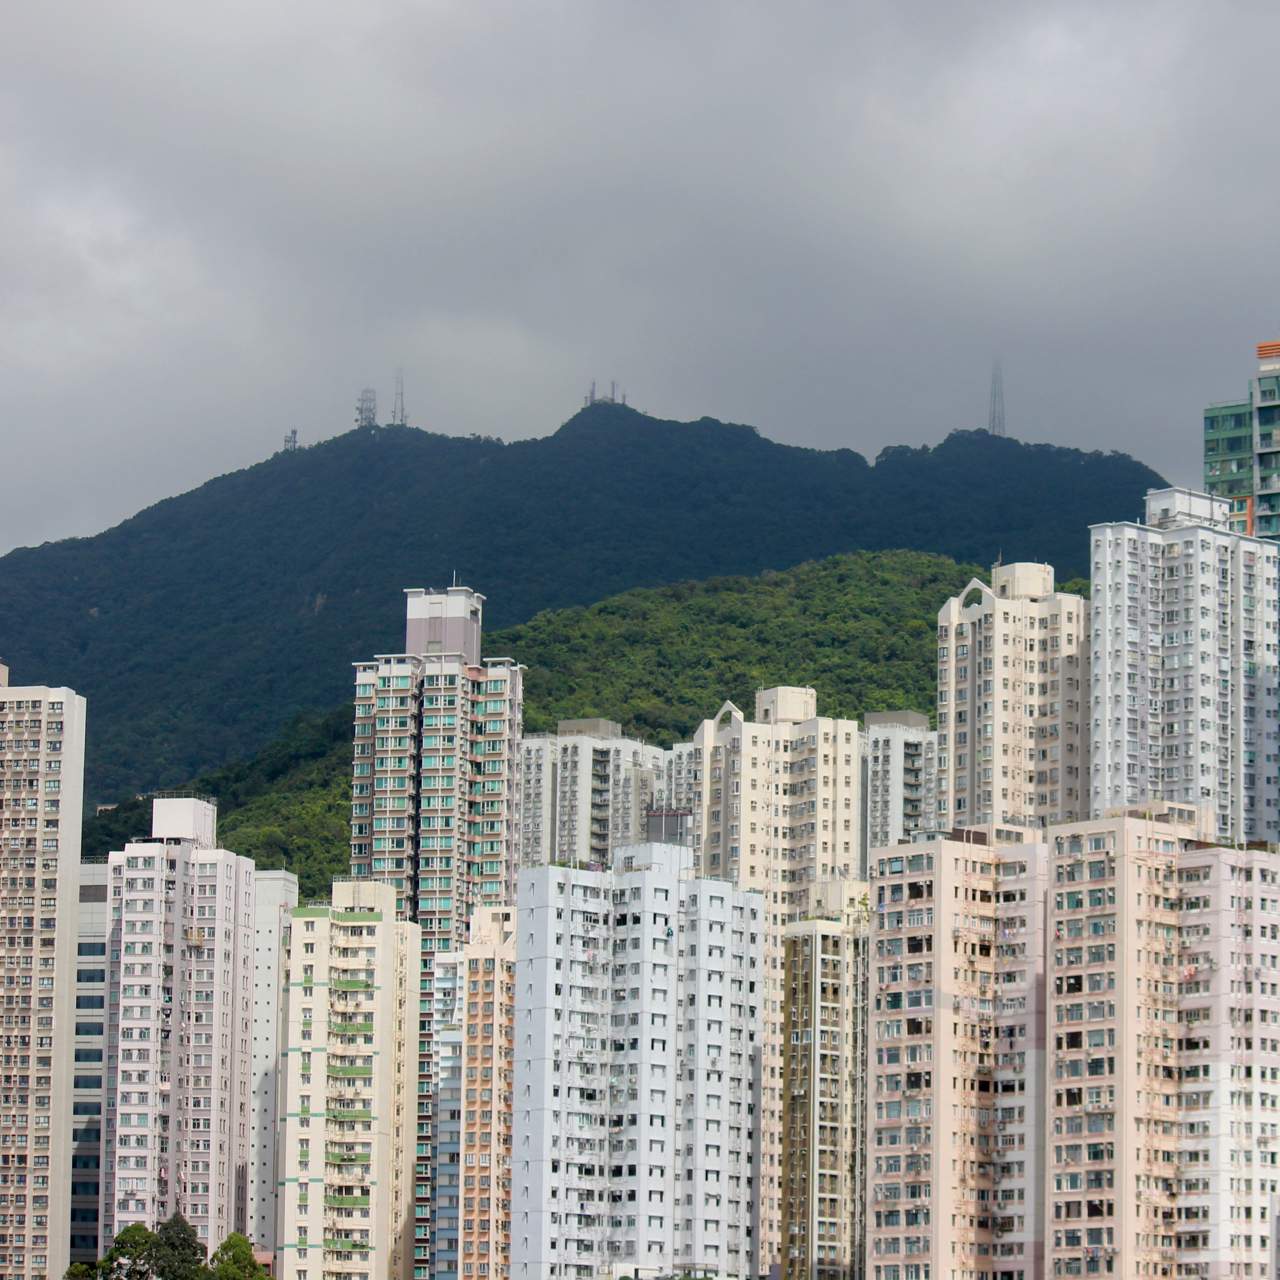 Hong Kong - 31